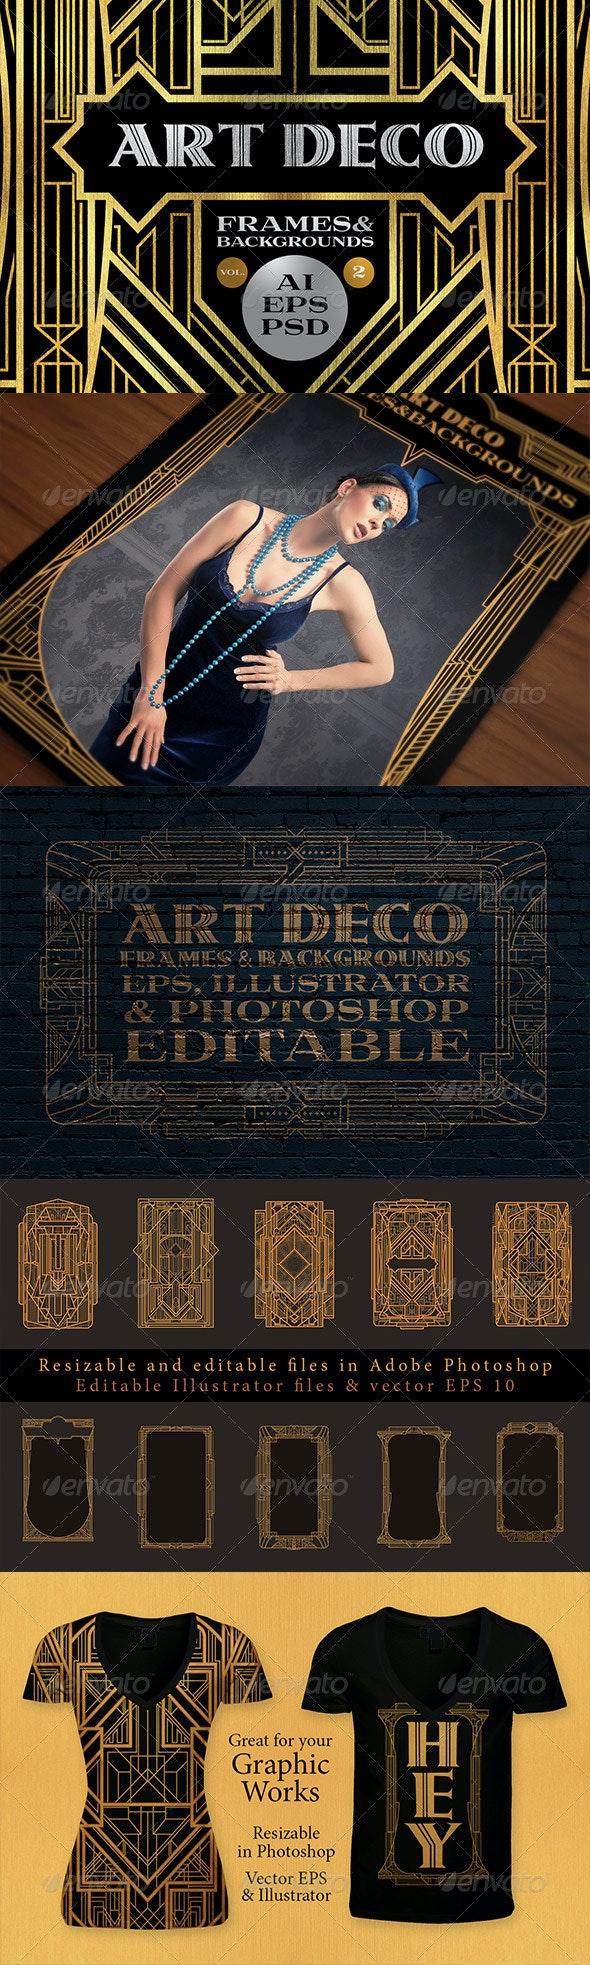 10 Frames Vol.2 - Art Deco Style - Borders Decorative